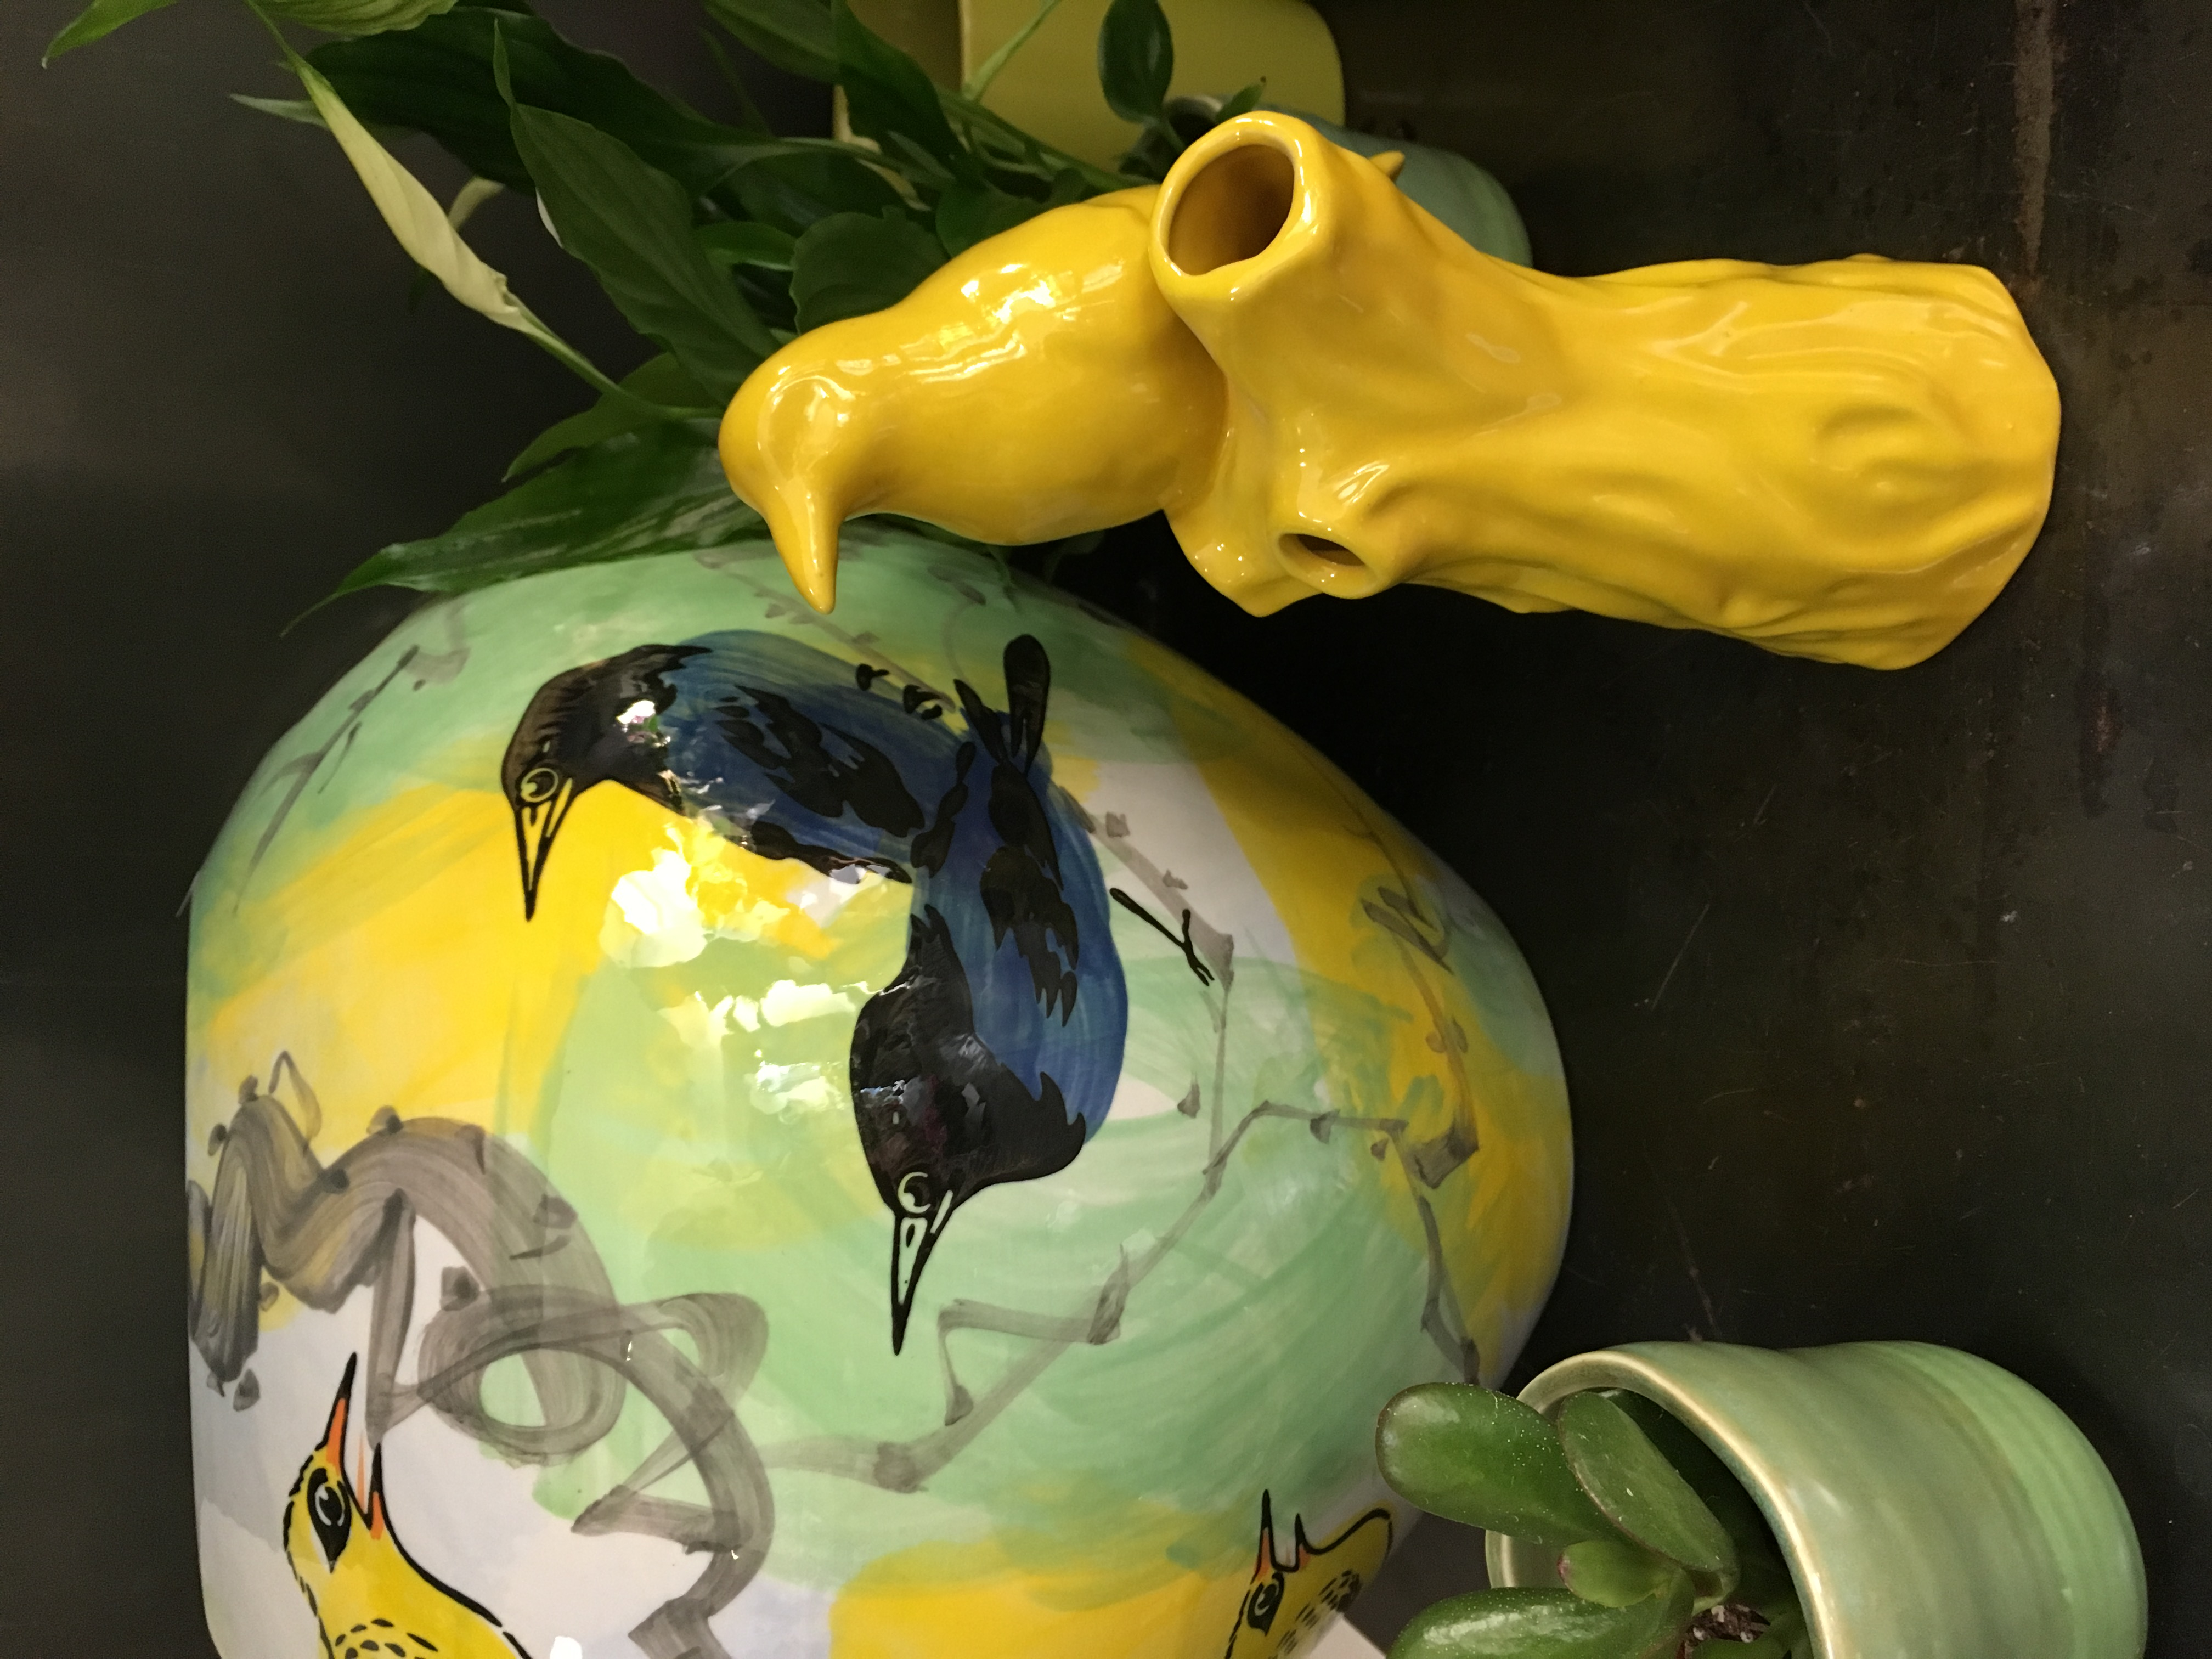 Vases verre oiseaux Marlies Fleurs fleuriste Nimes